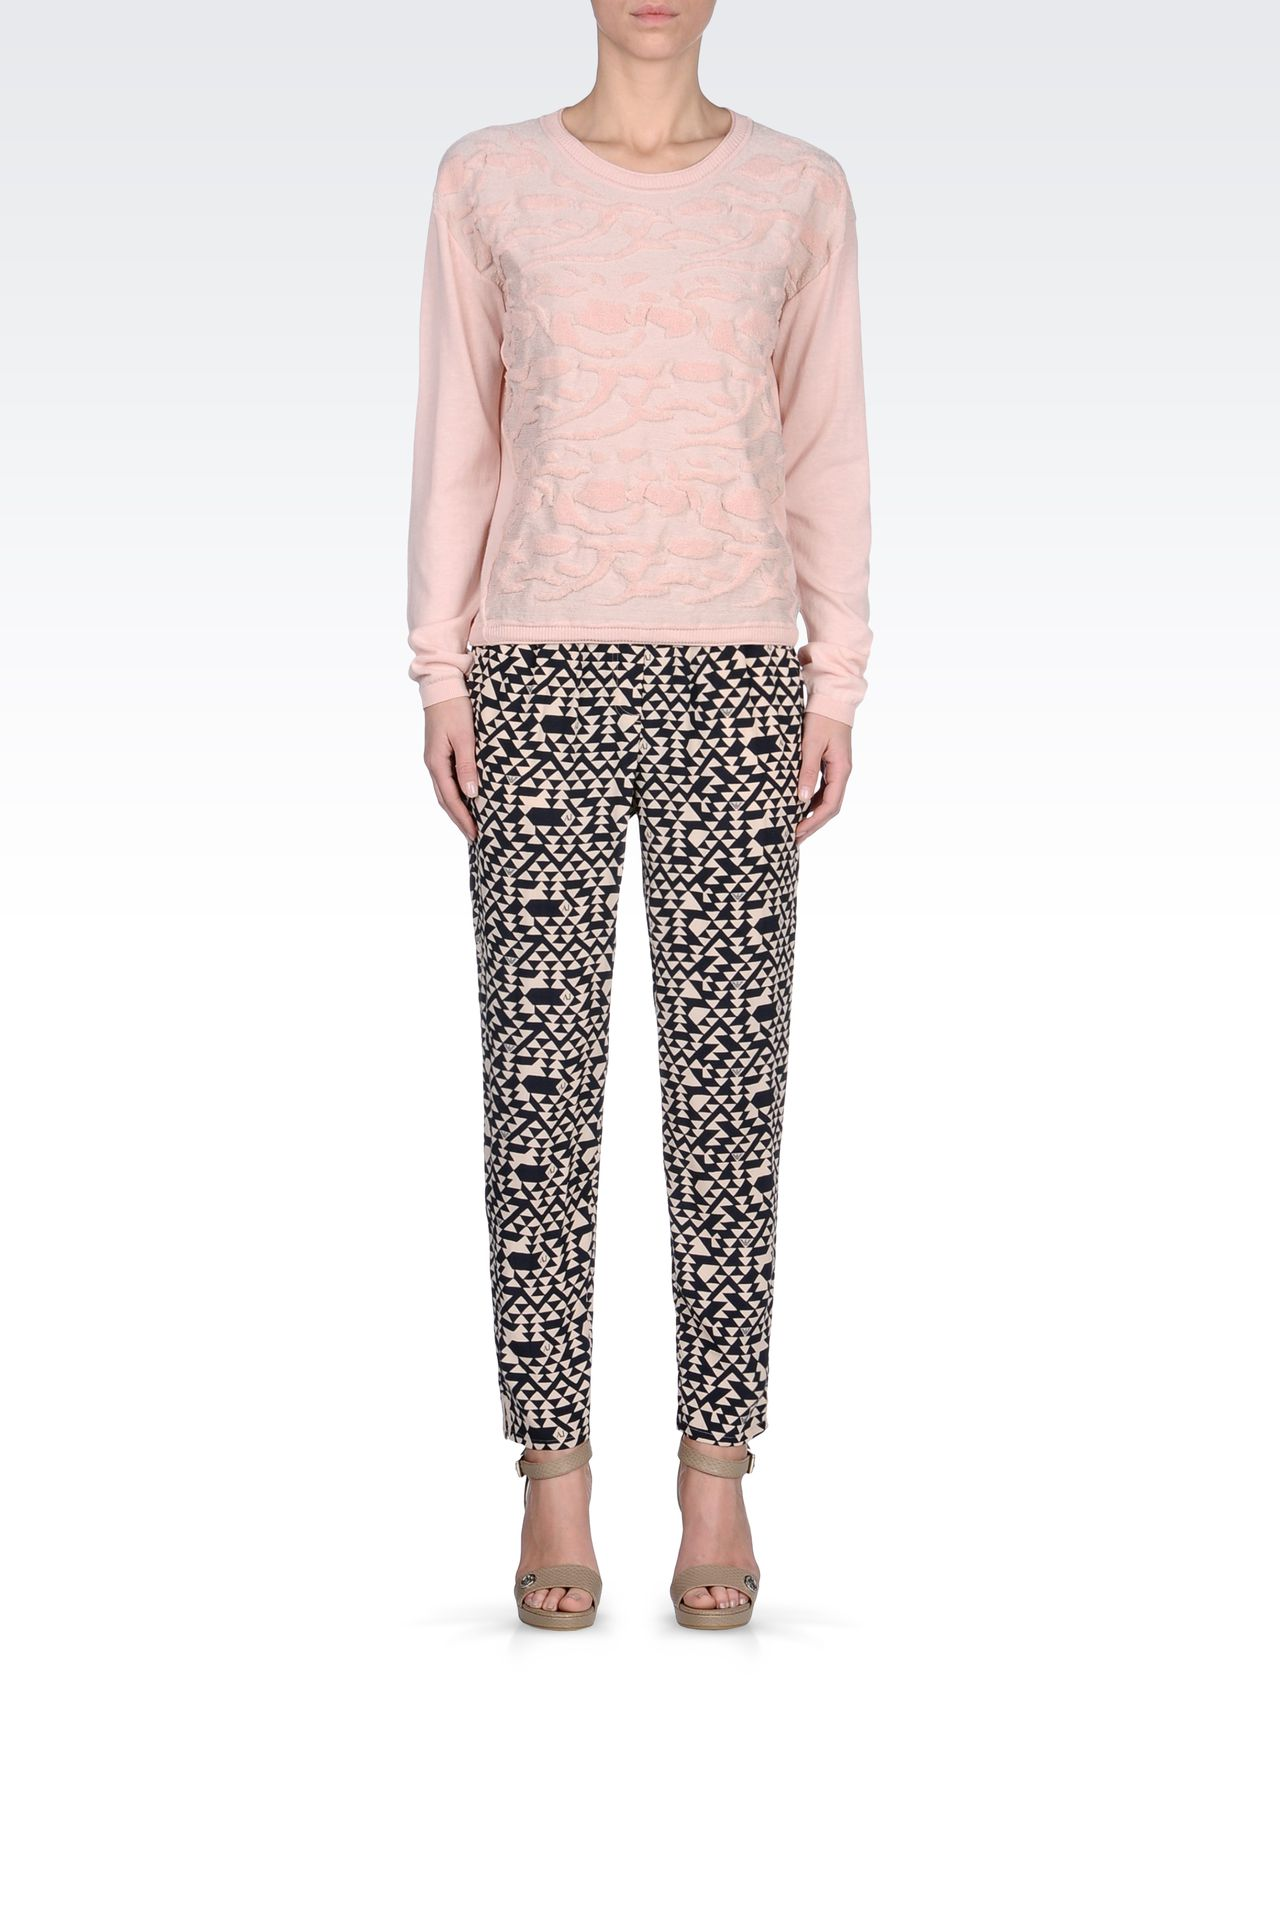 SWEATER IN LUREX COTTON JACQUARD: Crewneck sweaters Women by Armani - 0